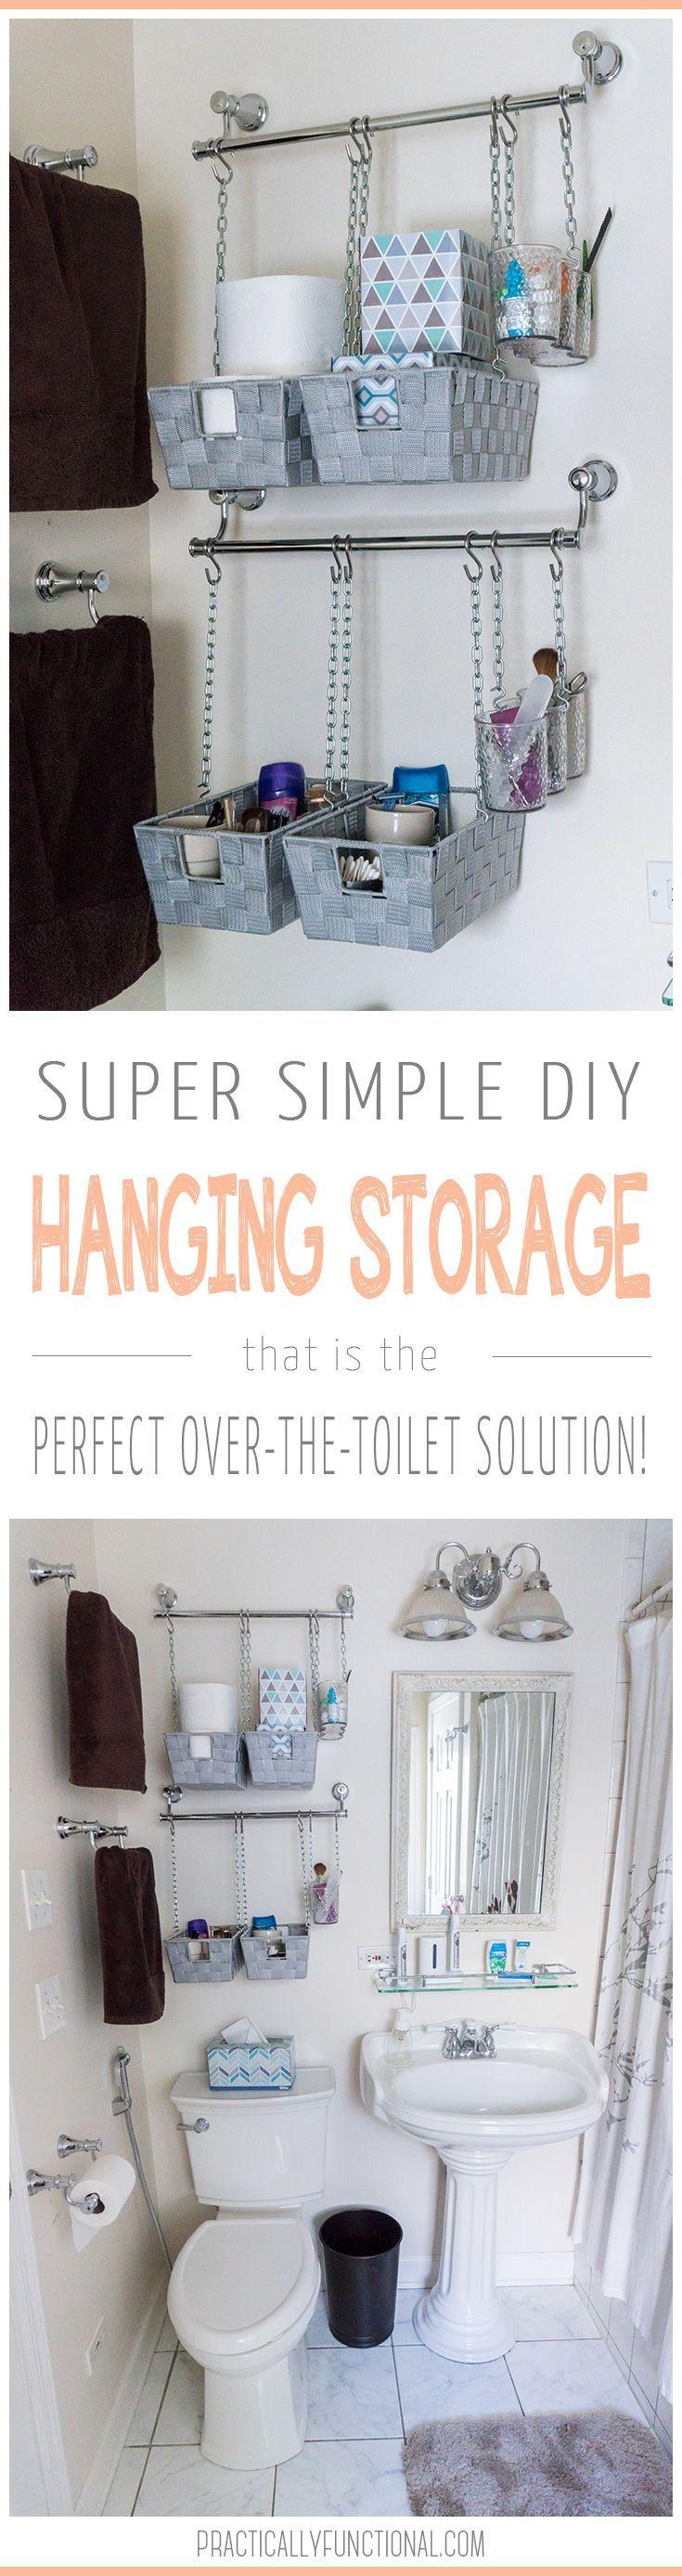 Diy Hanging Storage Bins For Over The Toilet Storage Bathroom